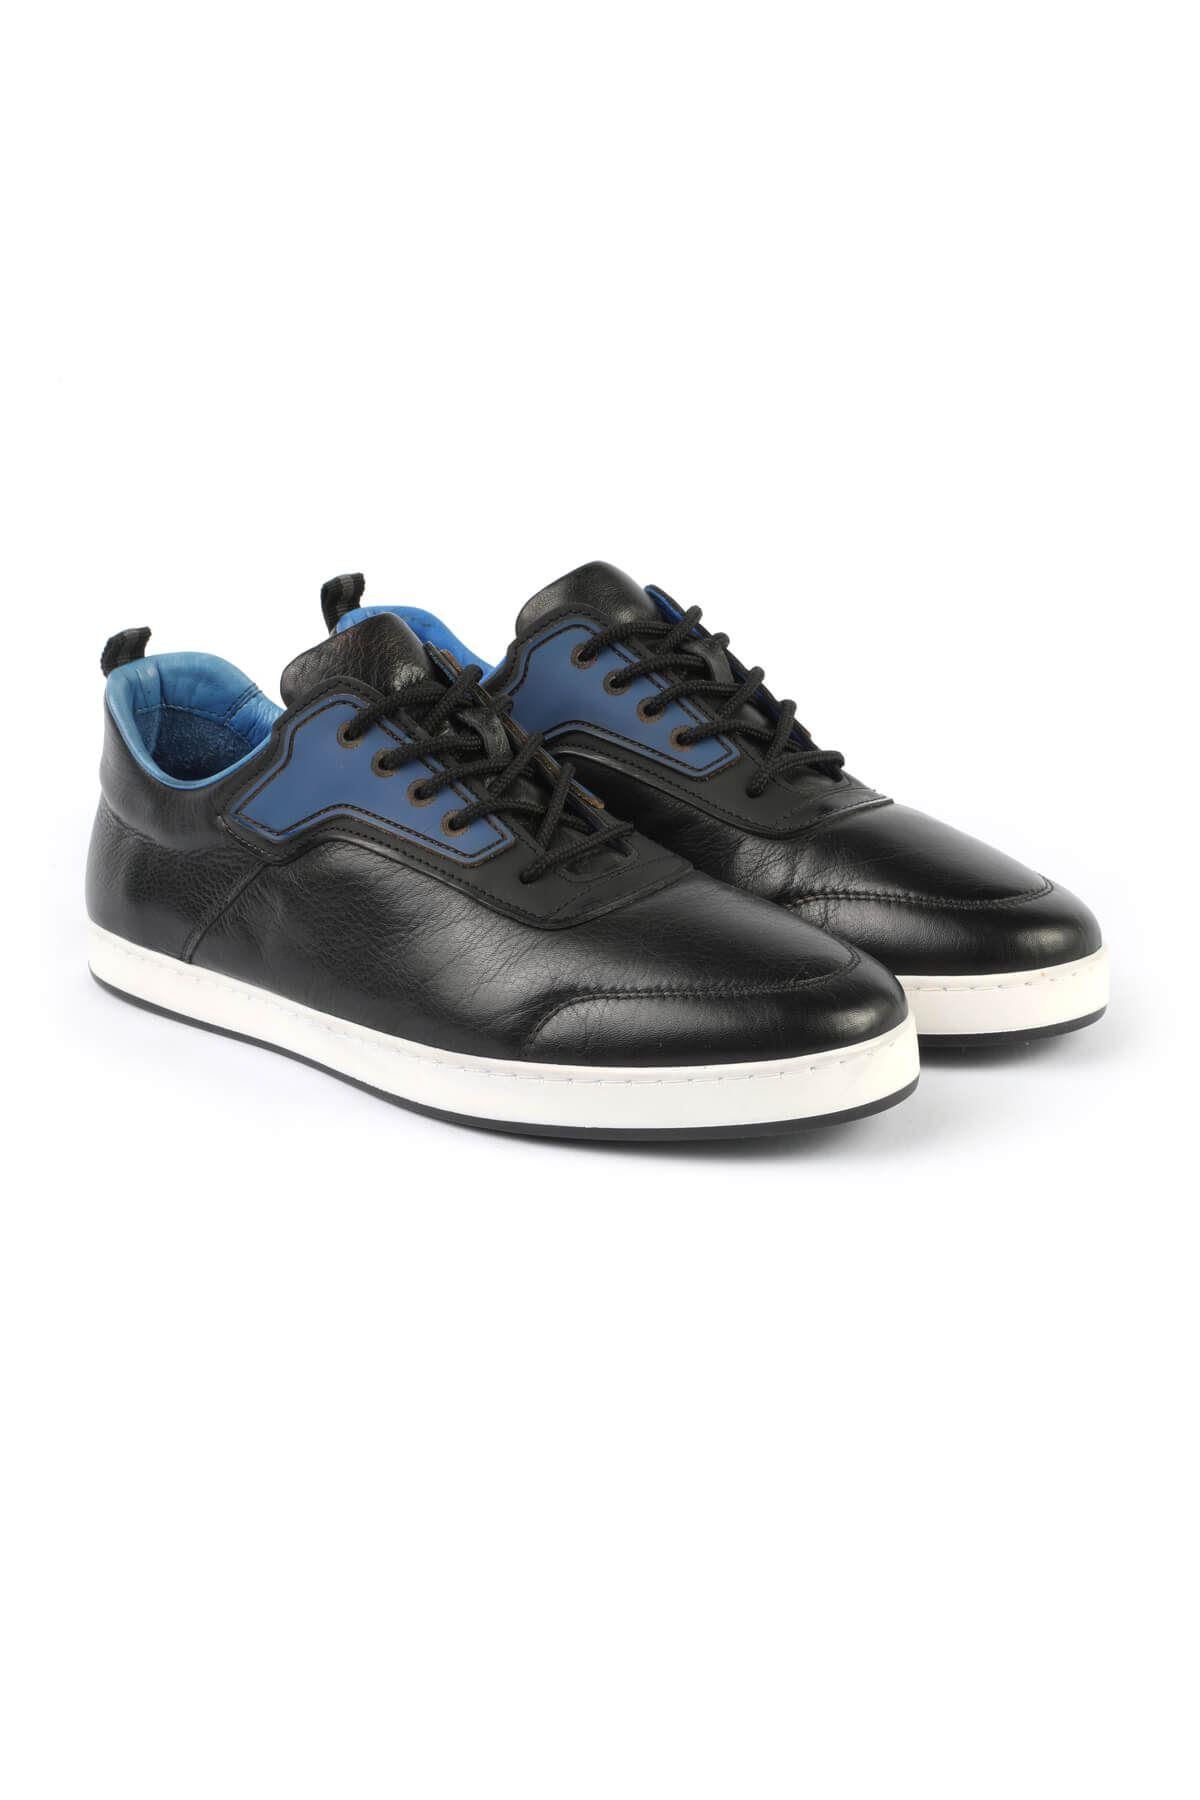 Libero 3105 Black Sneaker Shoes